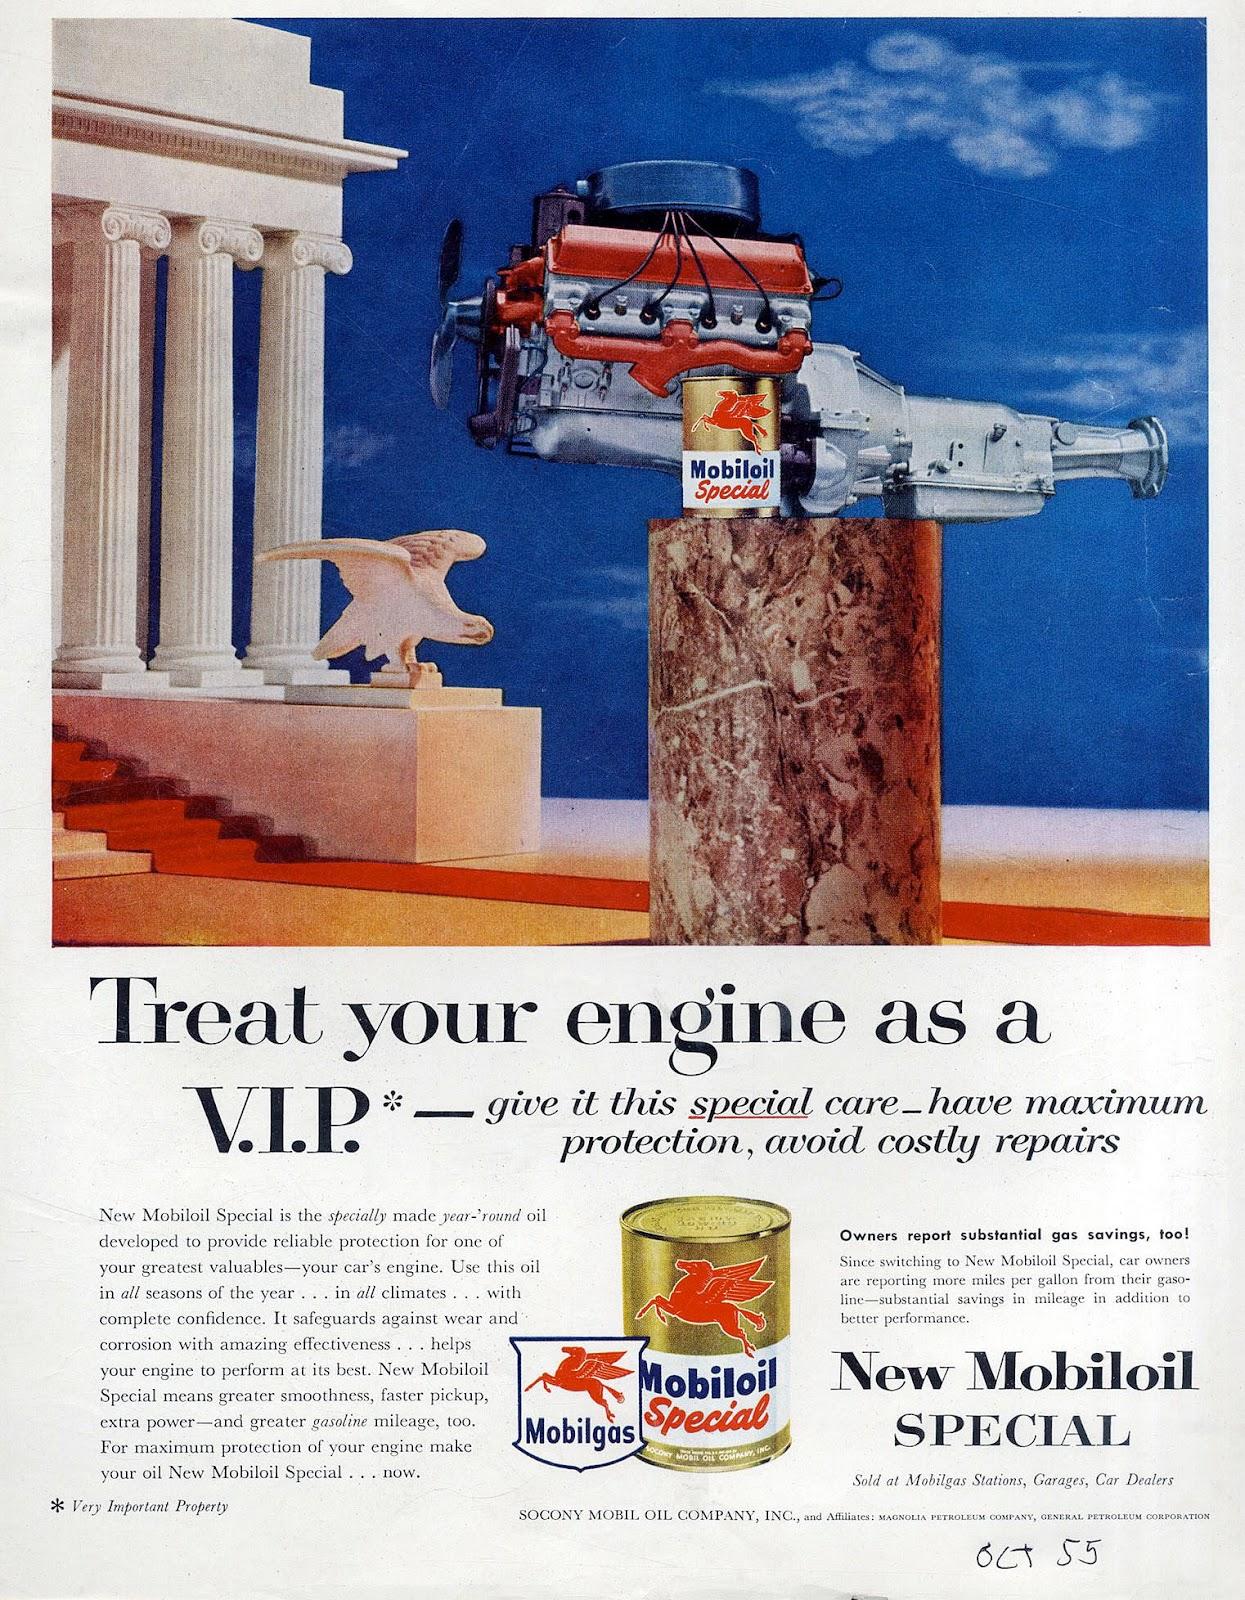 1940-49 Original 1941 Print Ad Mobilgas Mobiloil Bears Hibernation Dealer 2 Page Art Merchandise & Memorabilia